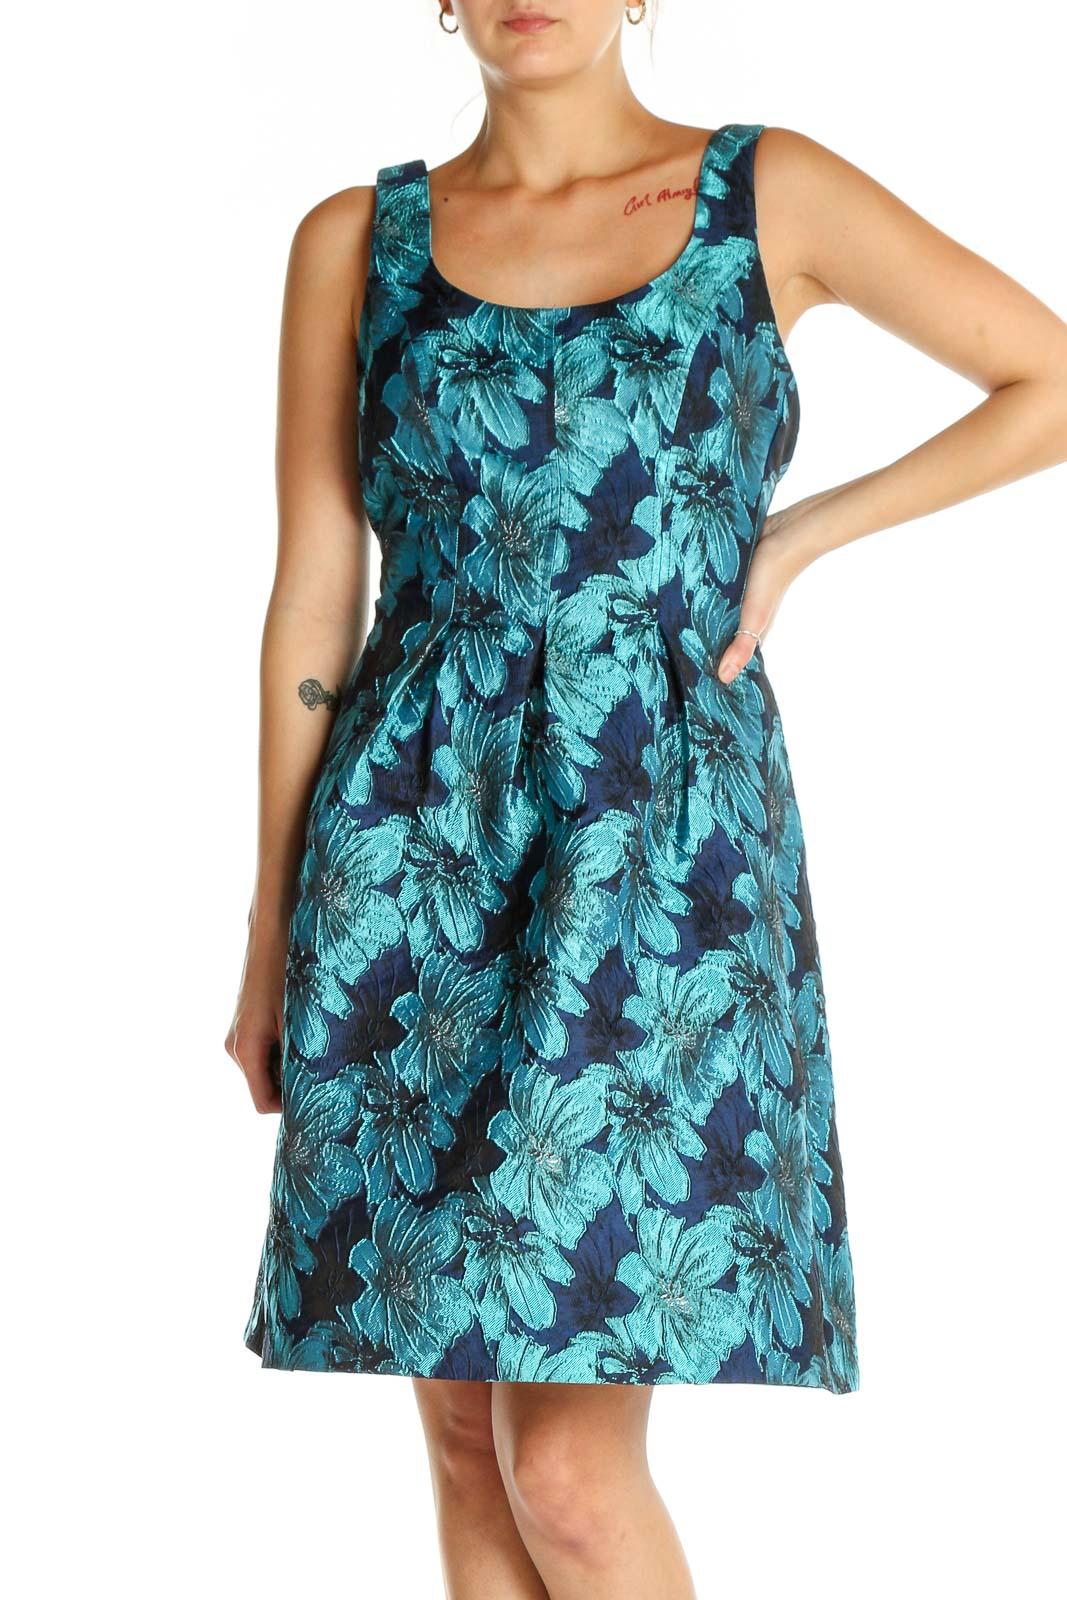 Blue Retro Fit & Flare Dress Front